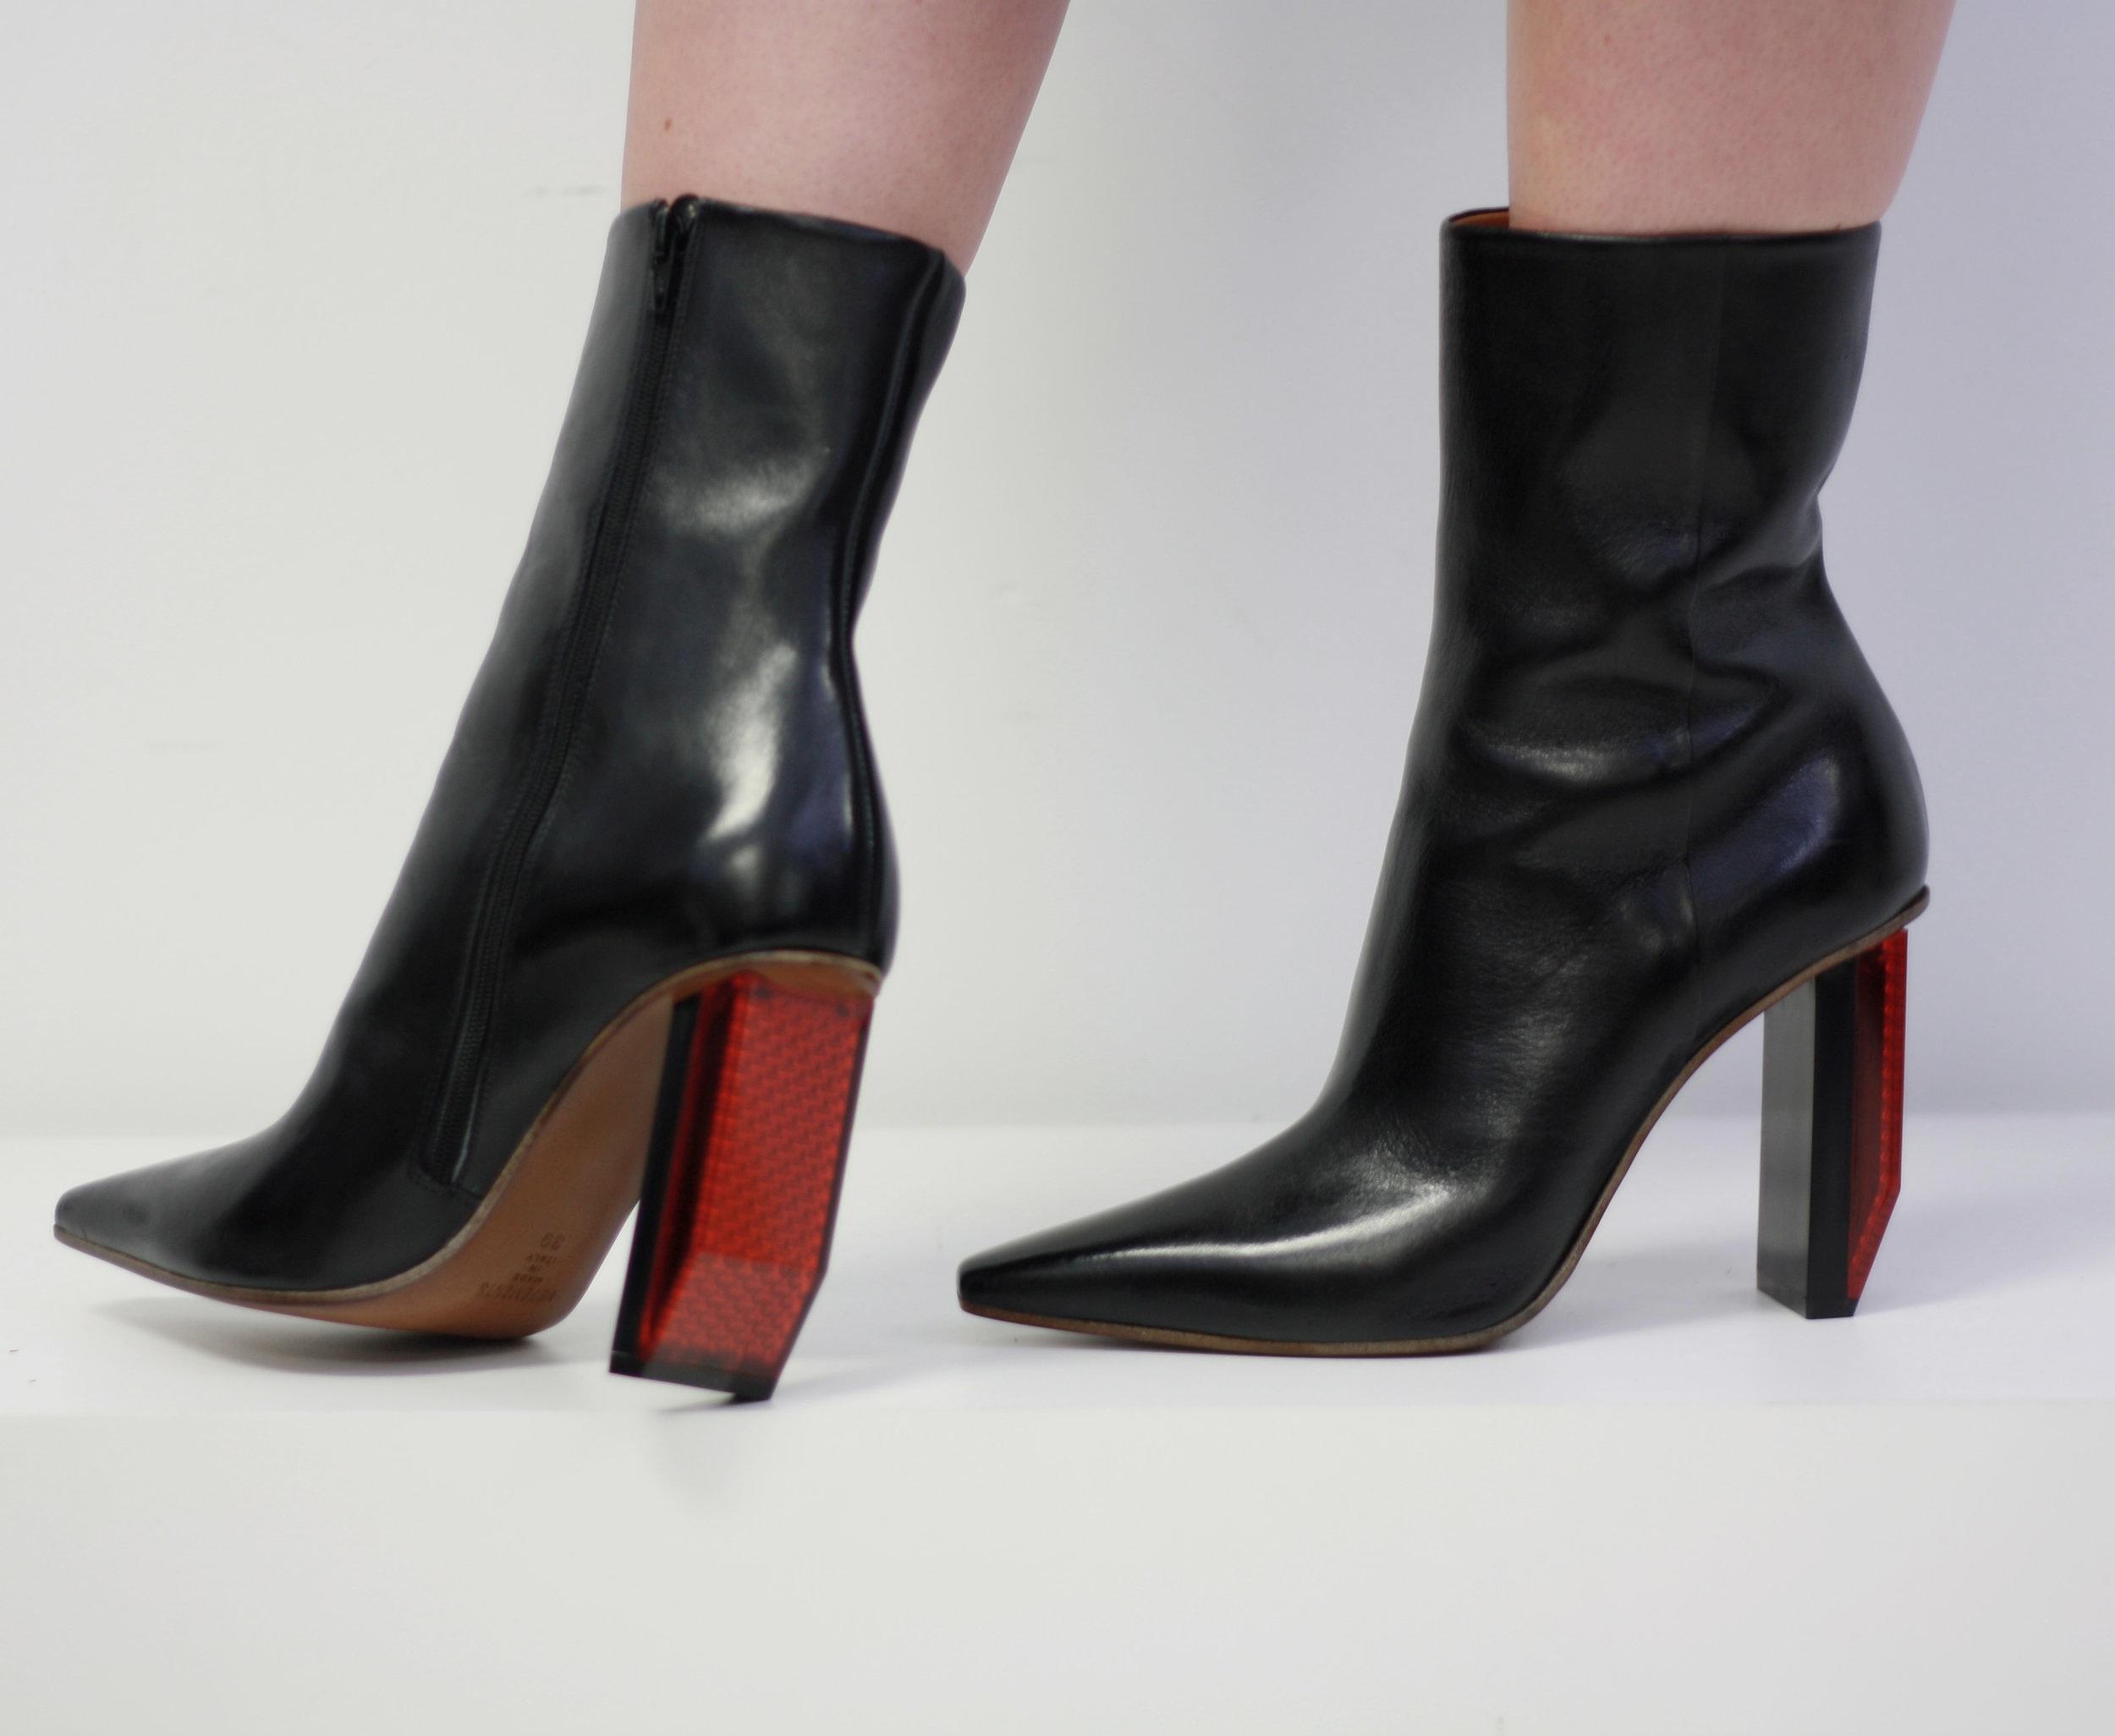 shoes3 (1).jpg